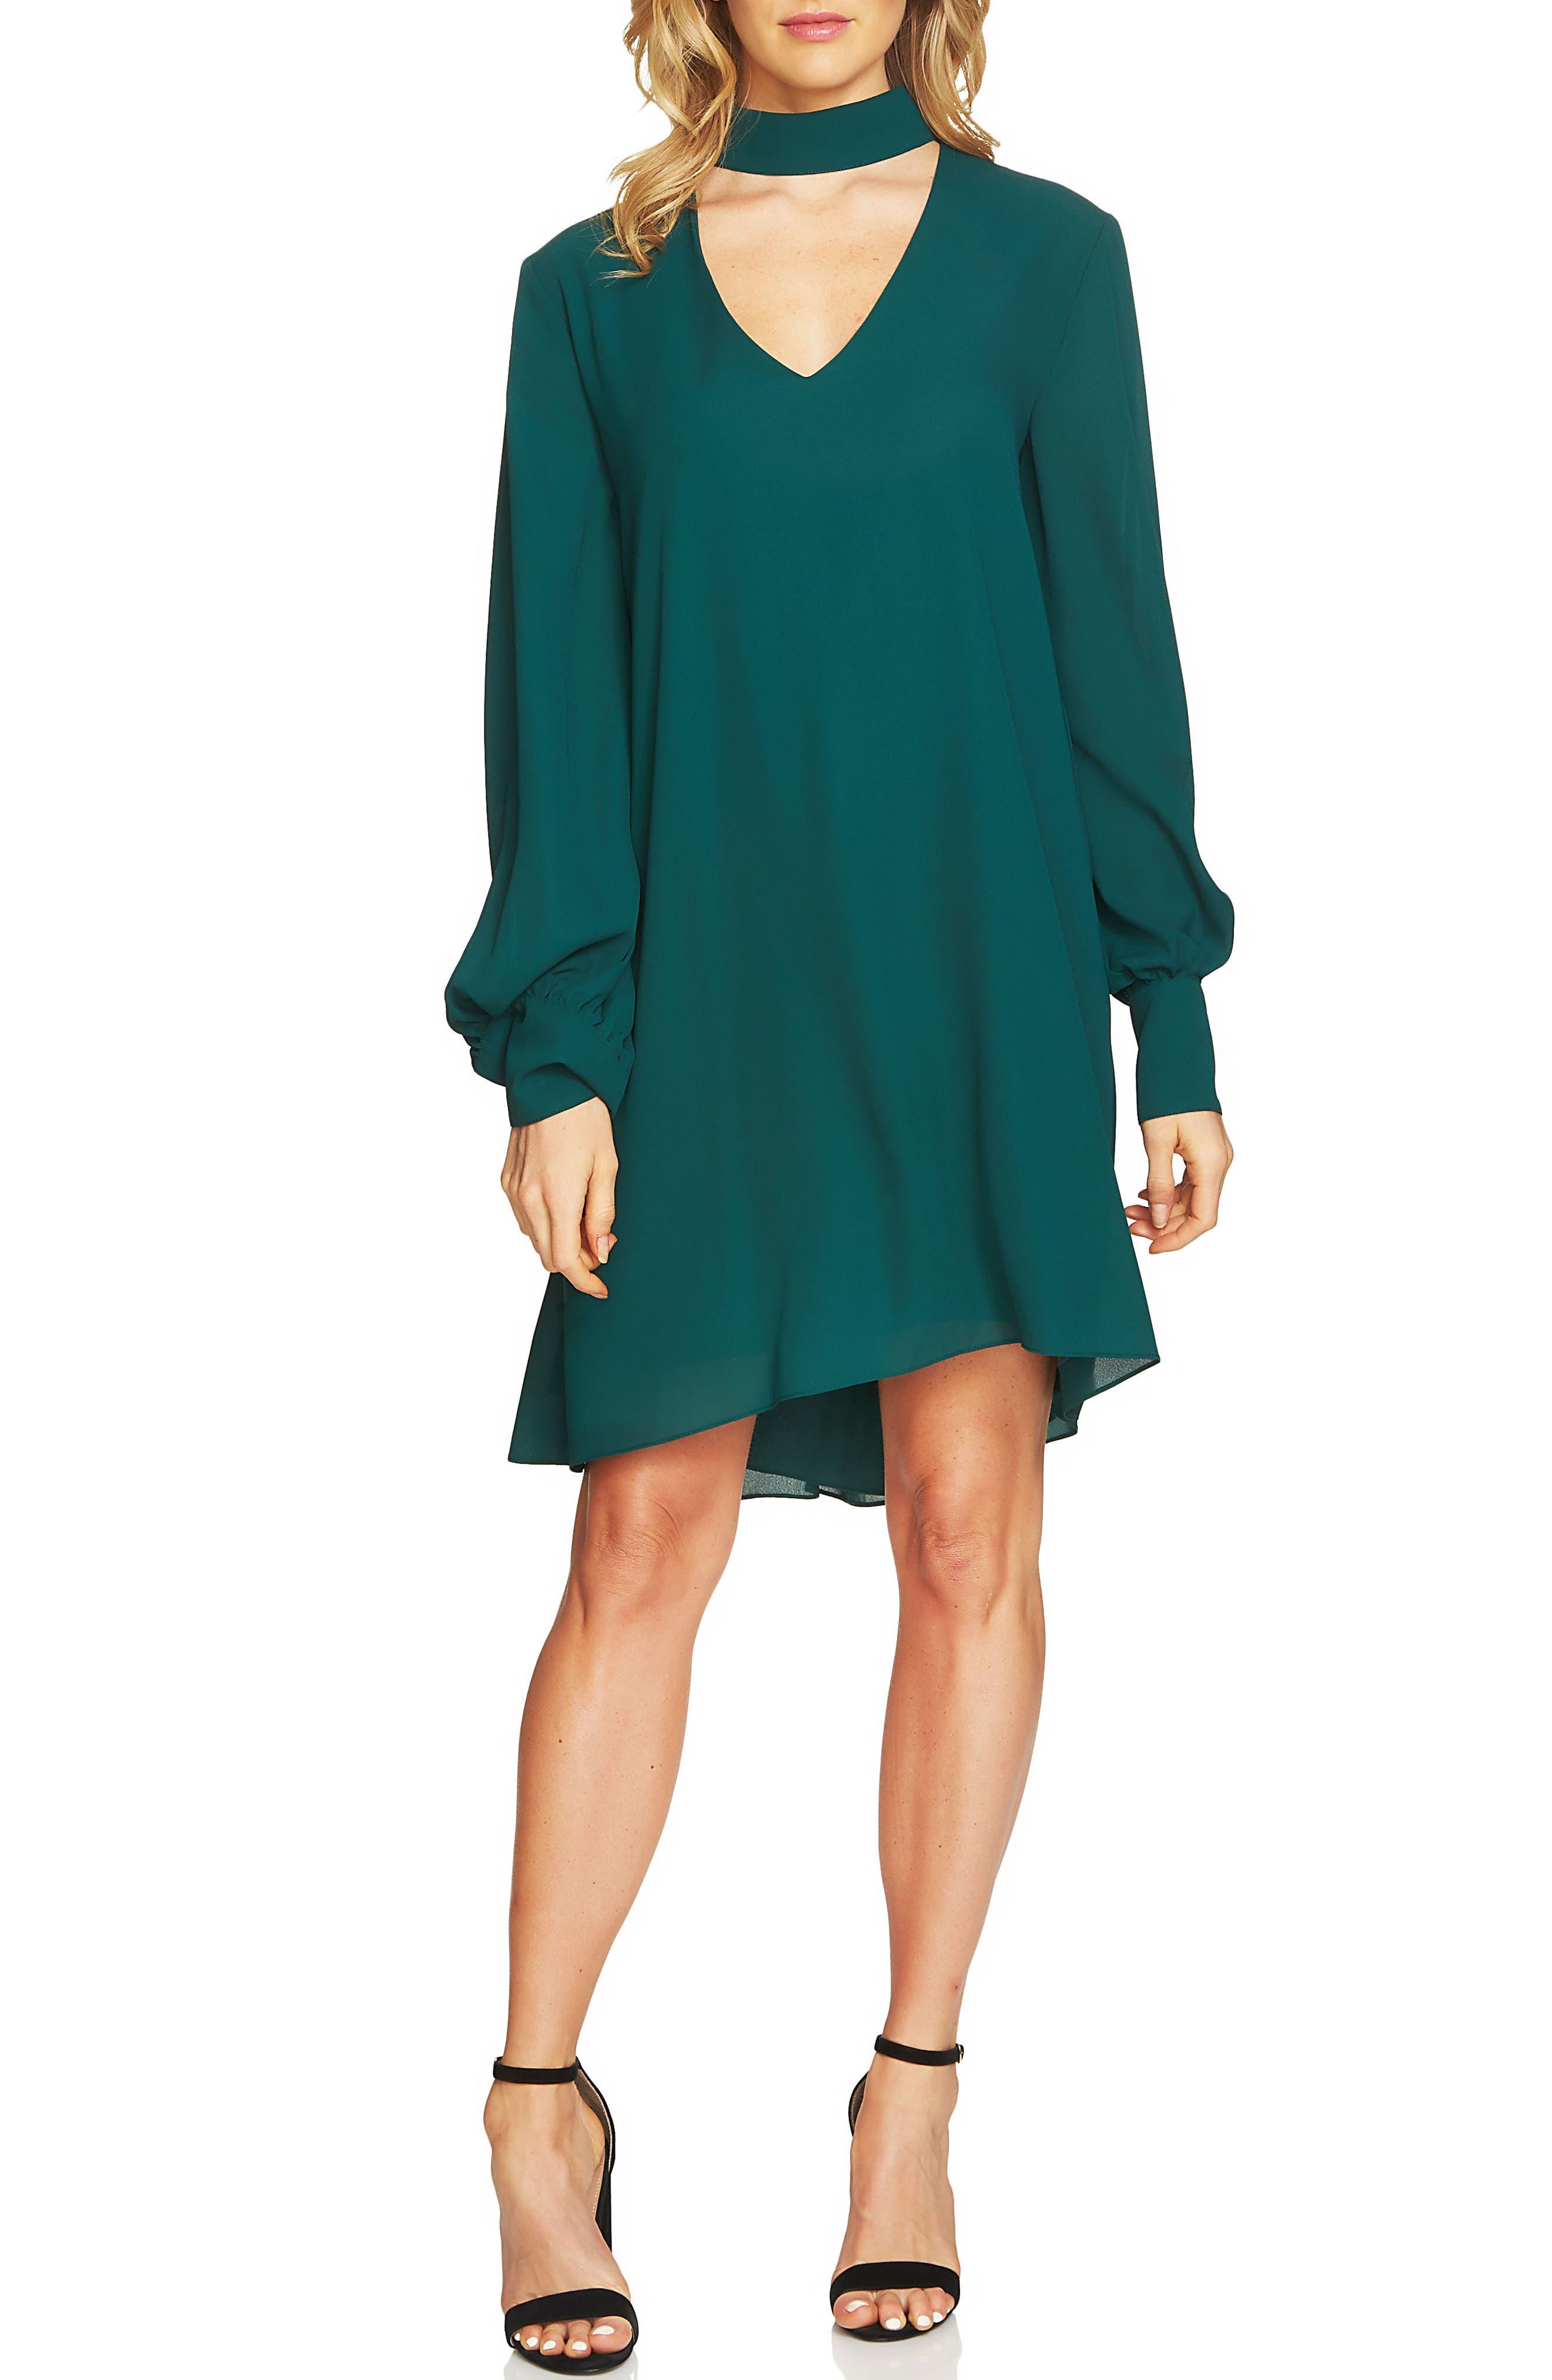 Alternate Image 1 Selected - Cece Zoey Choker Shift Dress